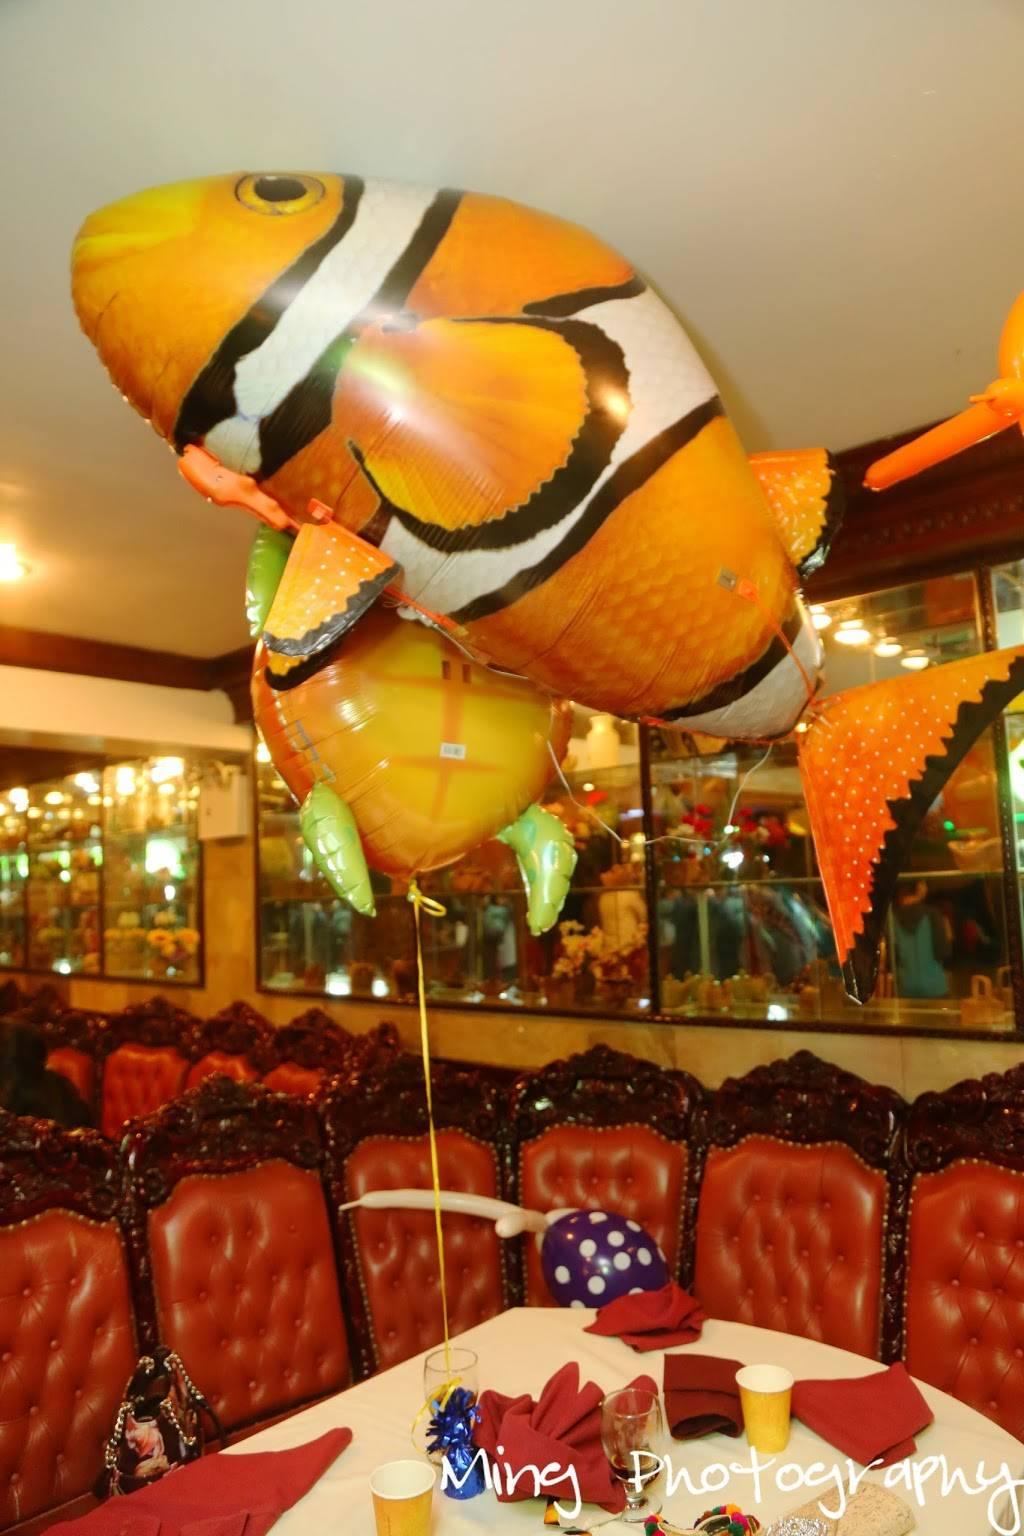 Tangra   restaurant   39-23 Queens Blvd, Sunnyside, NY 11104, USA   7187868008 OR +1 718-786-8008